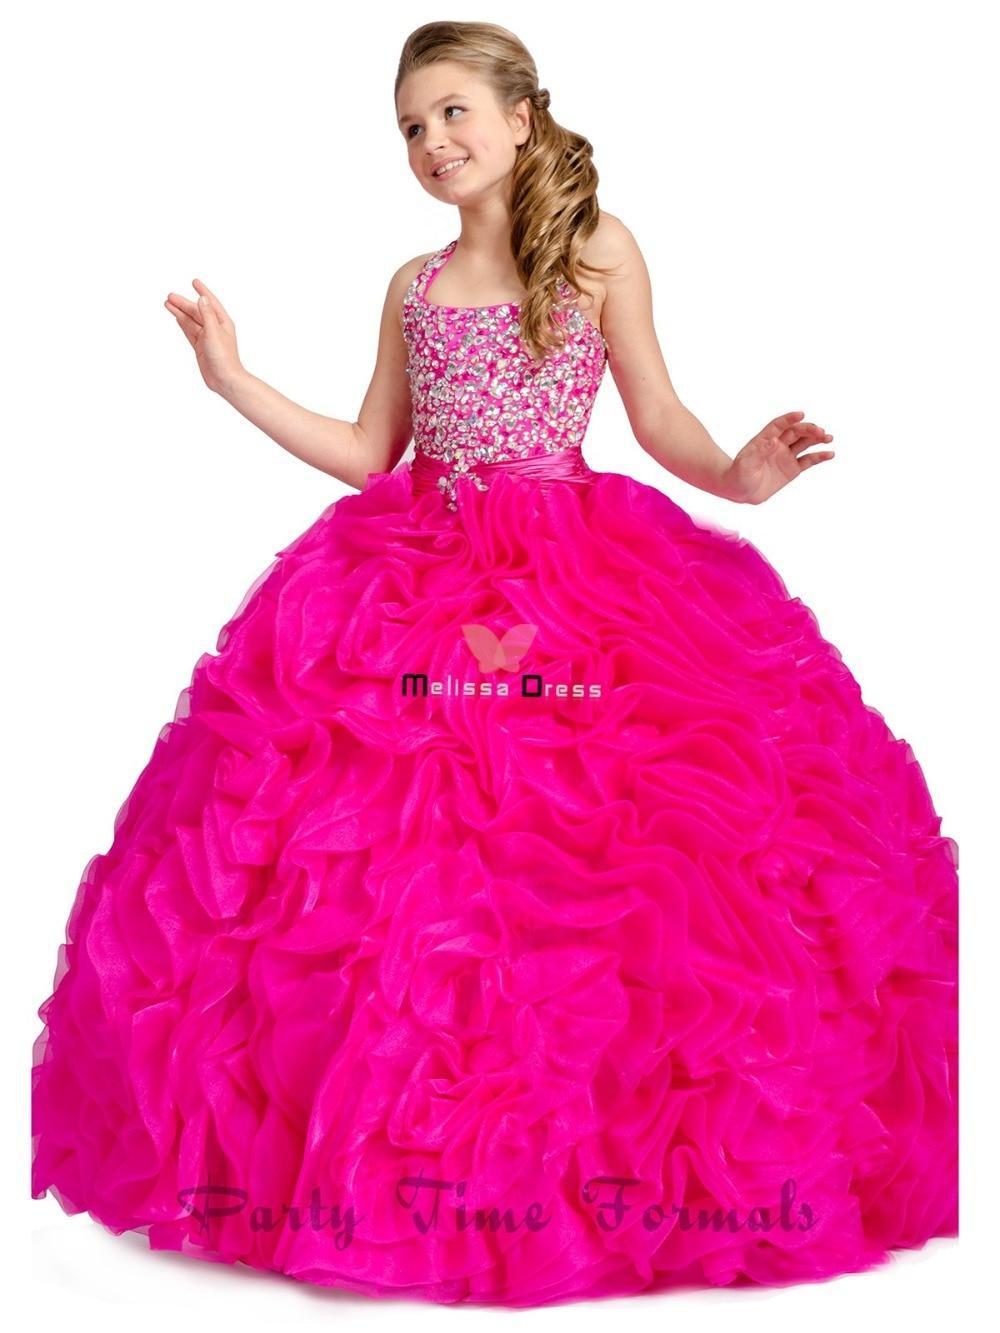 Wedding Dresses For 20 Year Olds   Shefalitayal